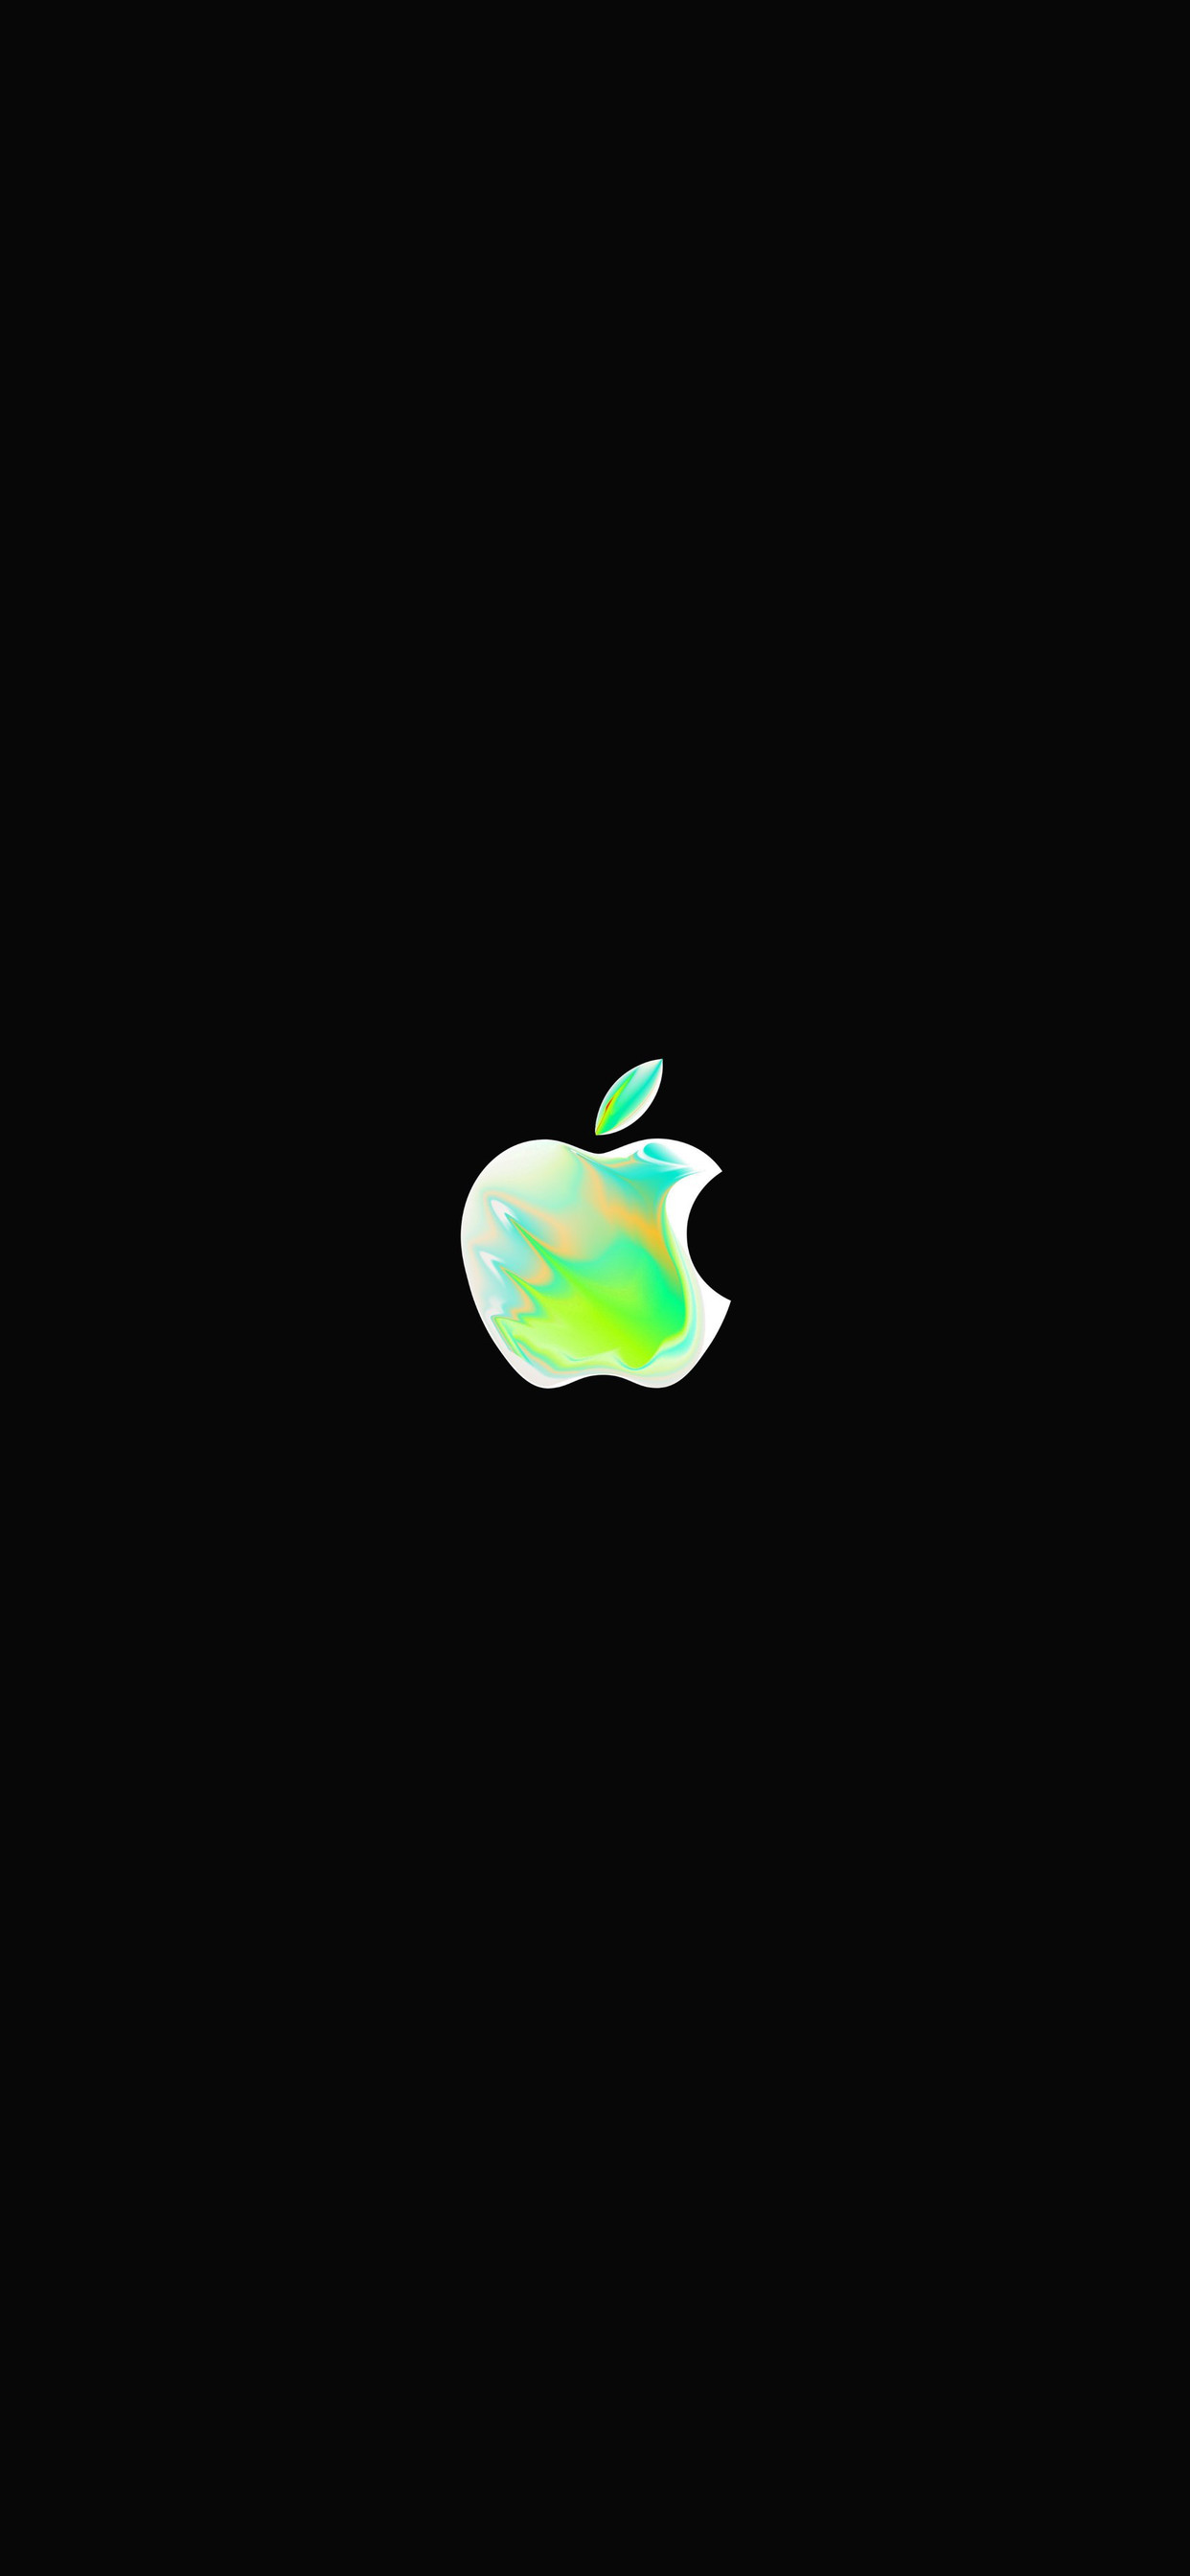 iPhone wallpaper apple logo 17 Apple logo